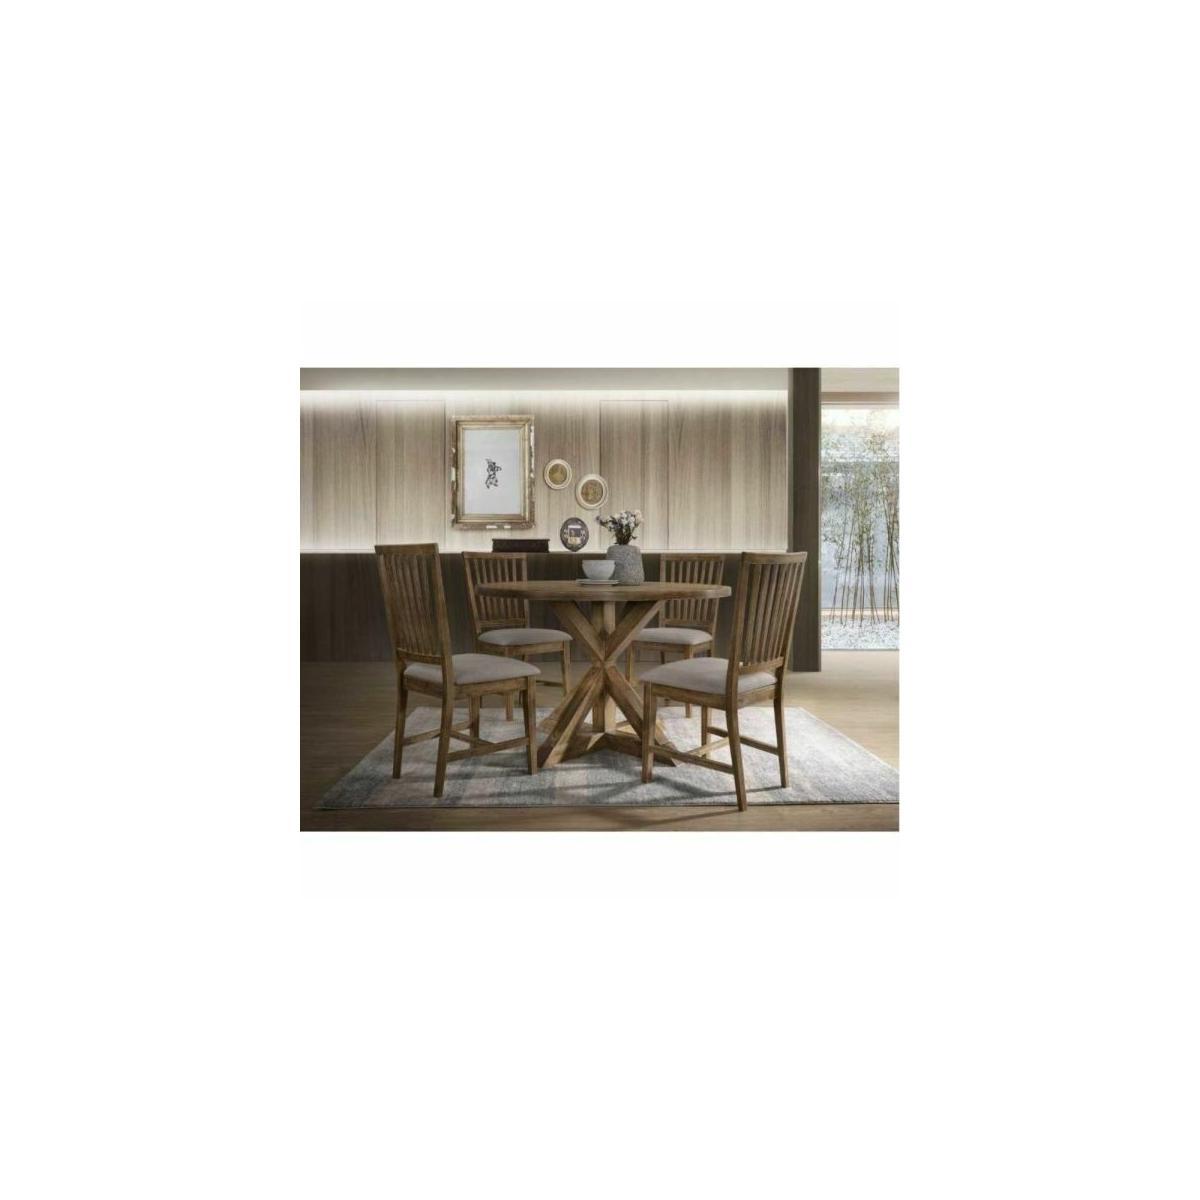 ACME Wallace II Dining Table - 72310 - Weathered Oak